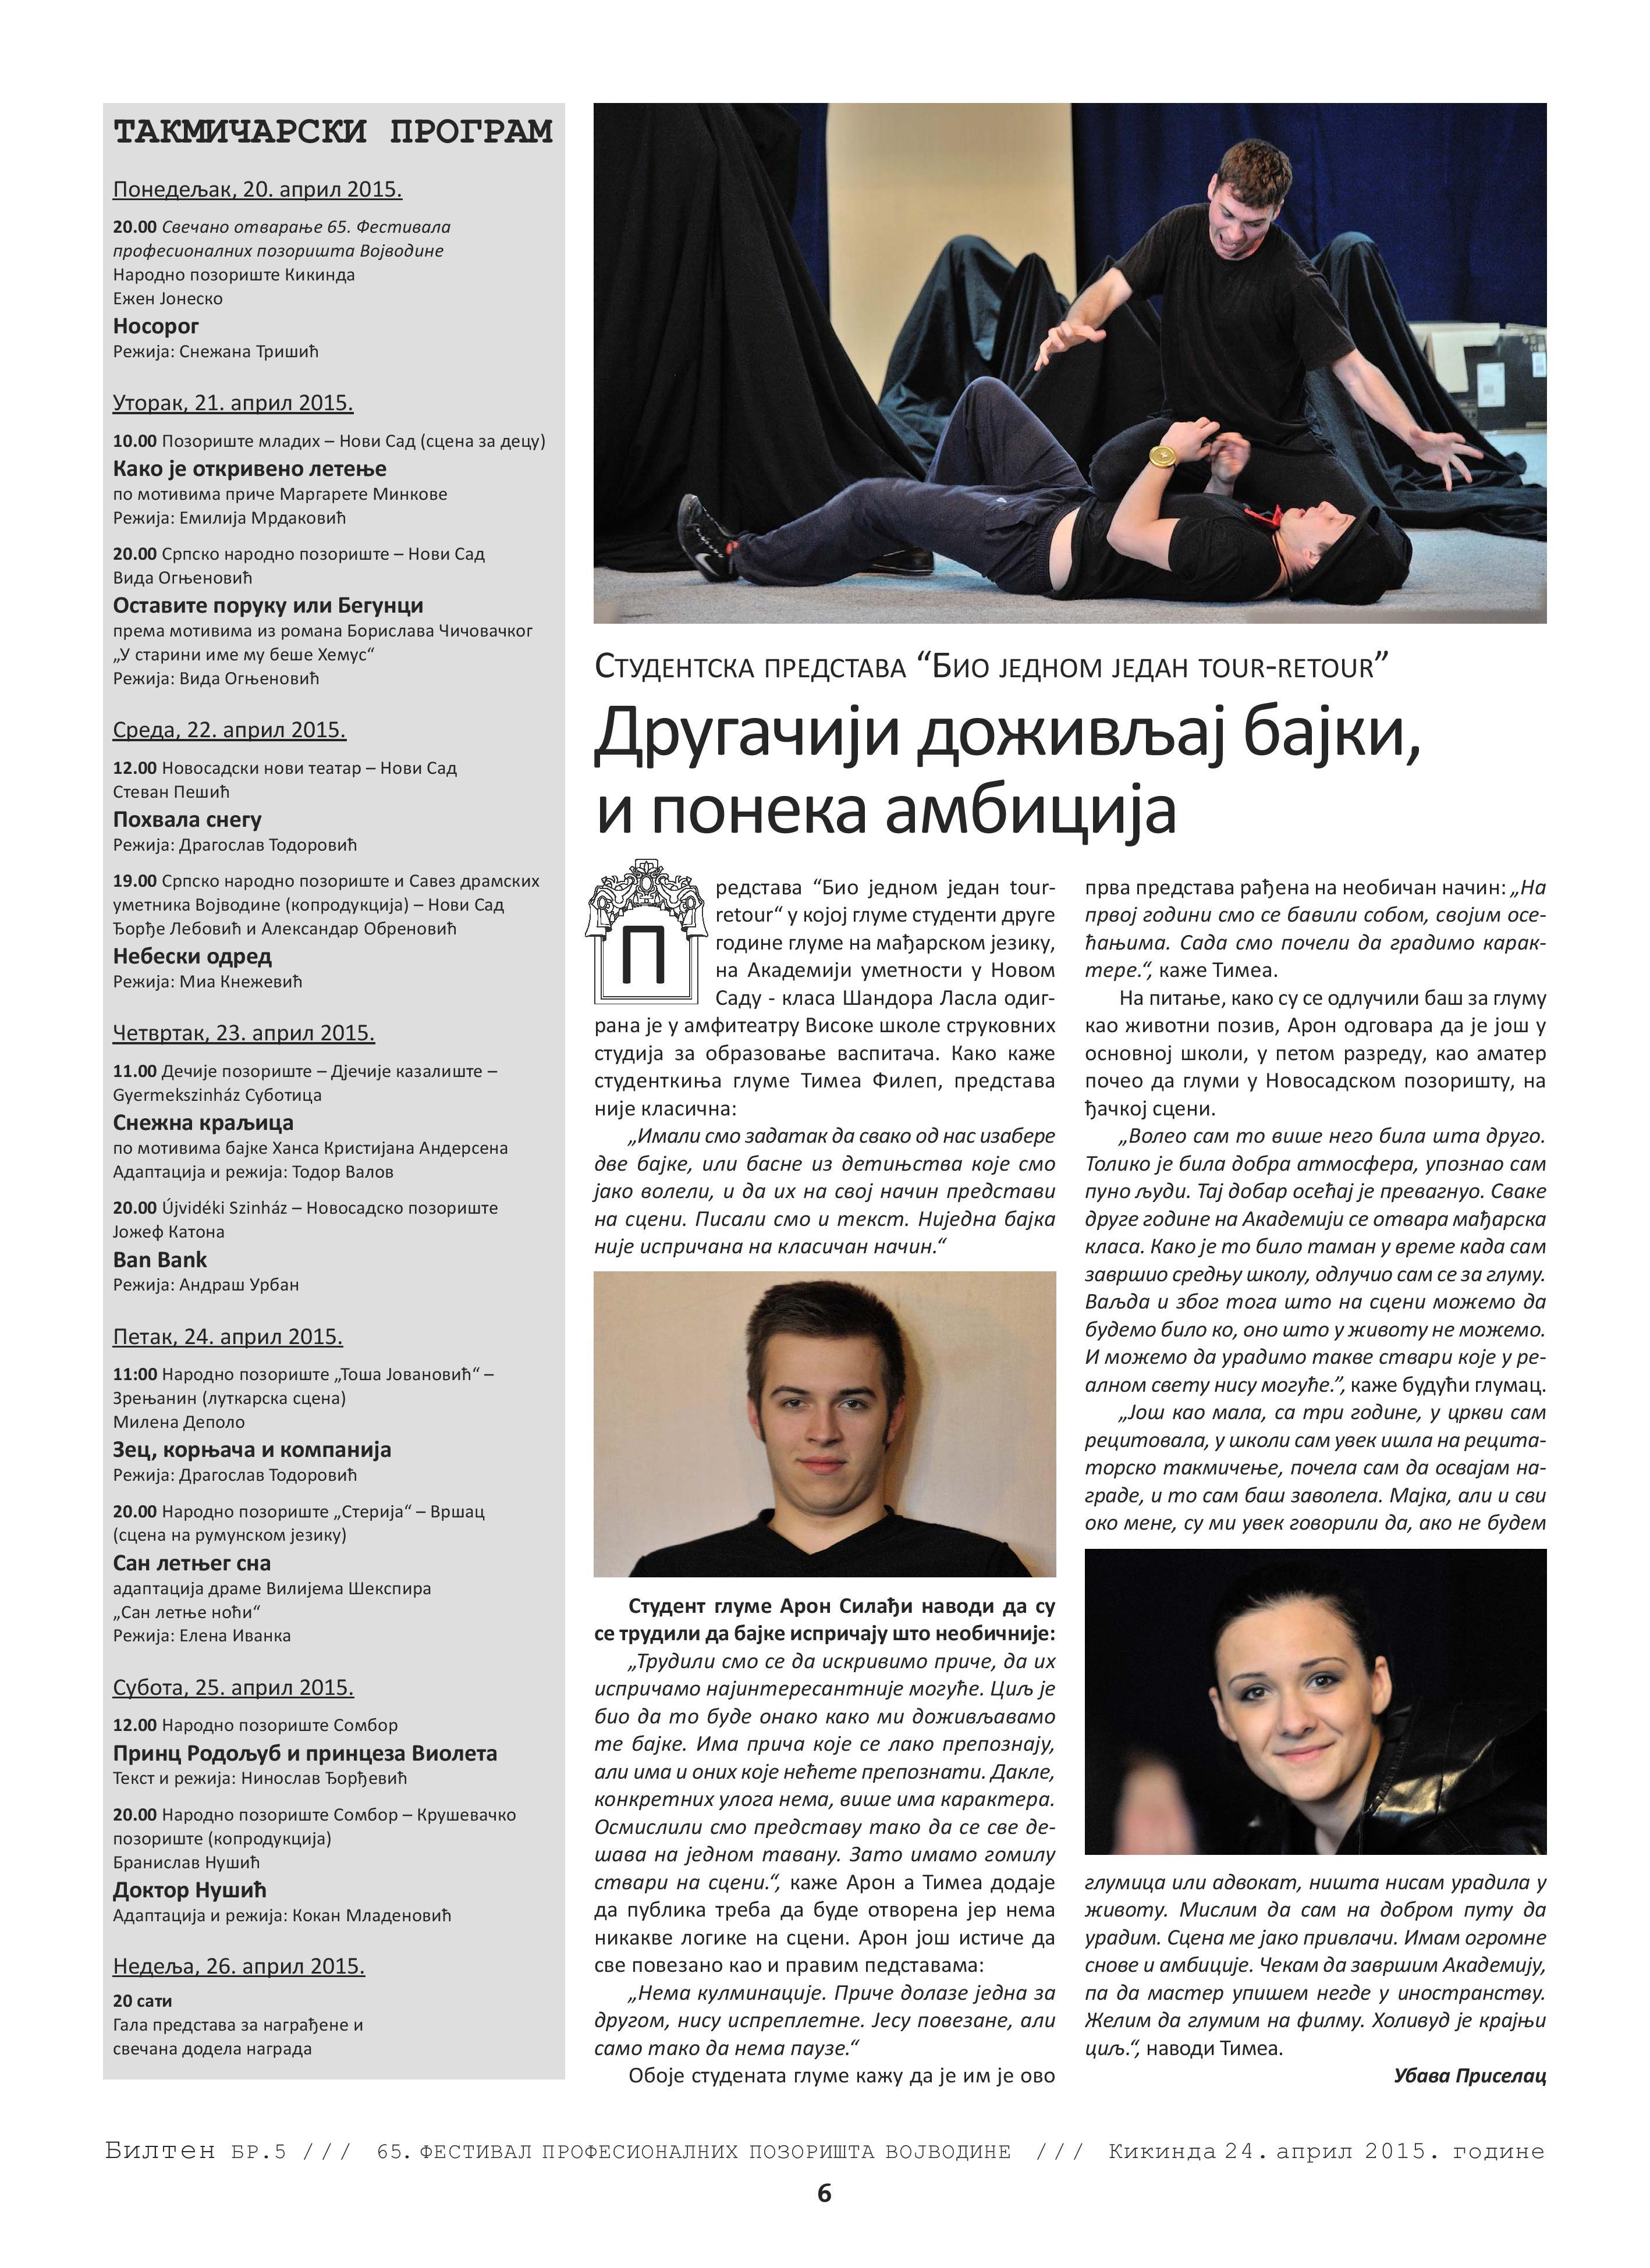 BILTEN_05_24 april-page-006